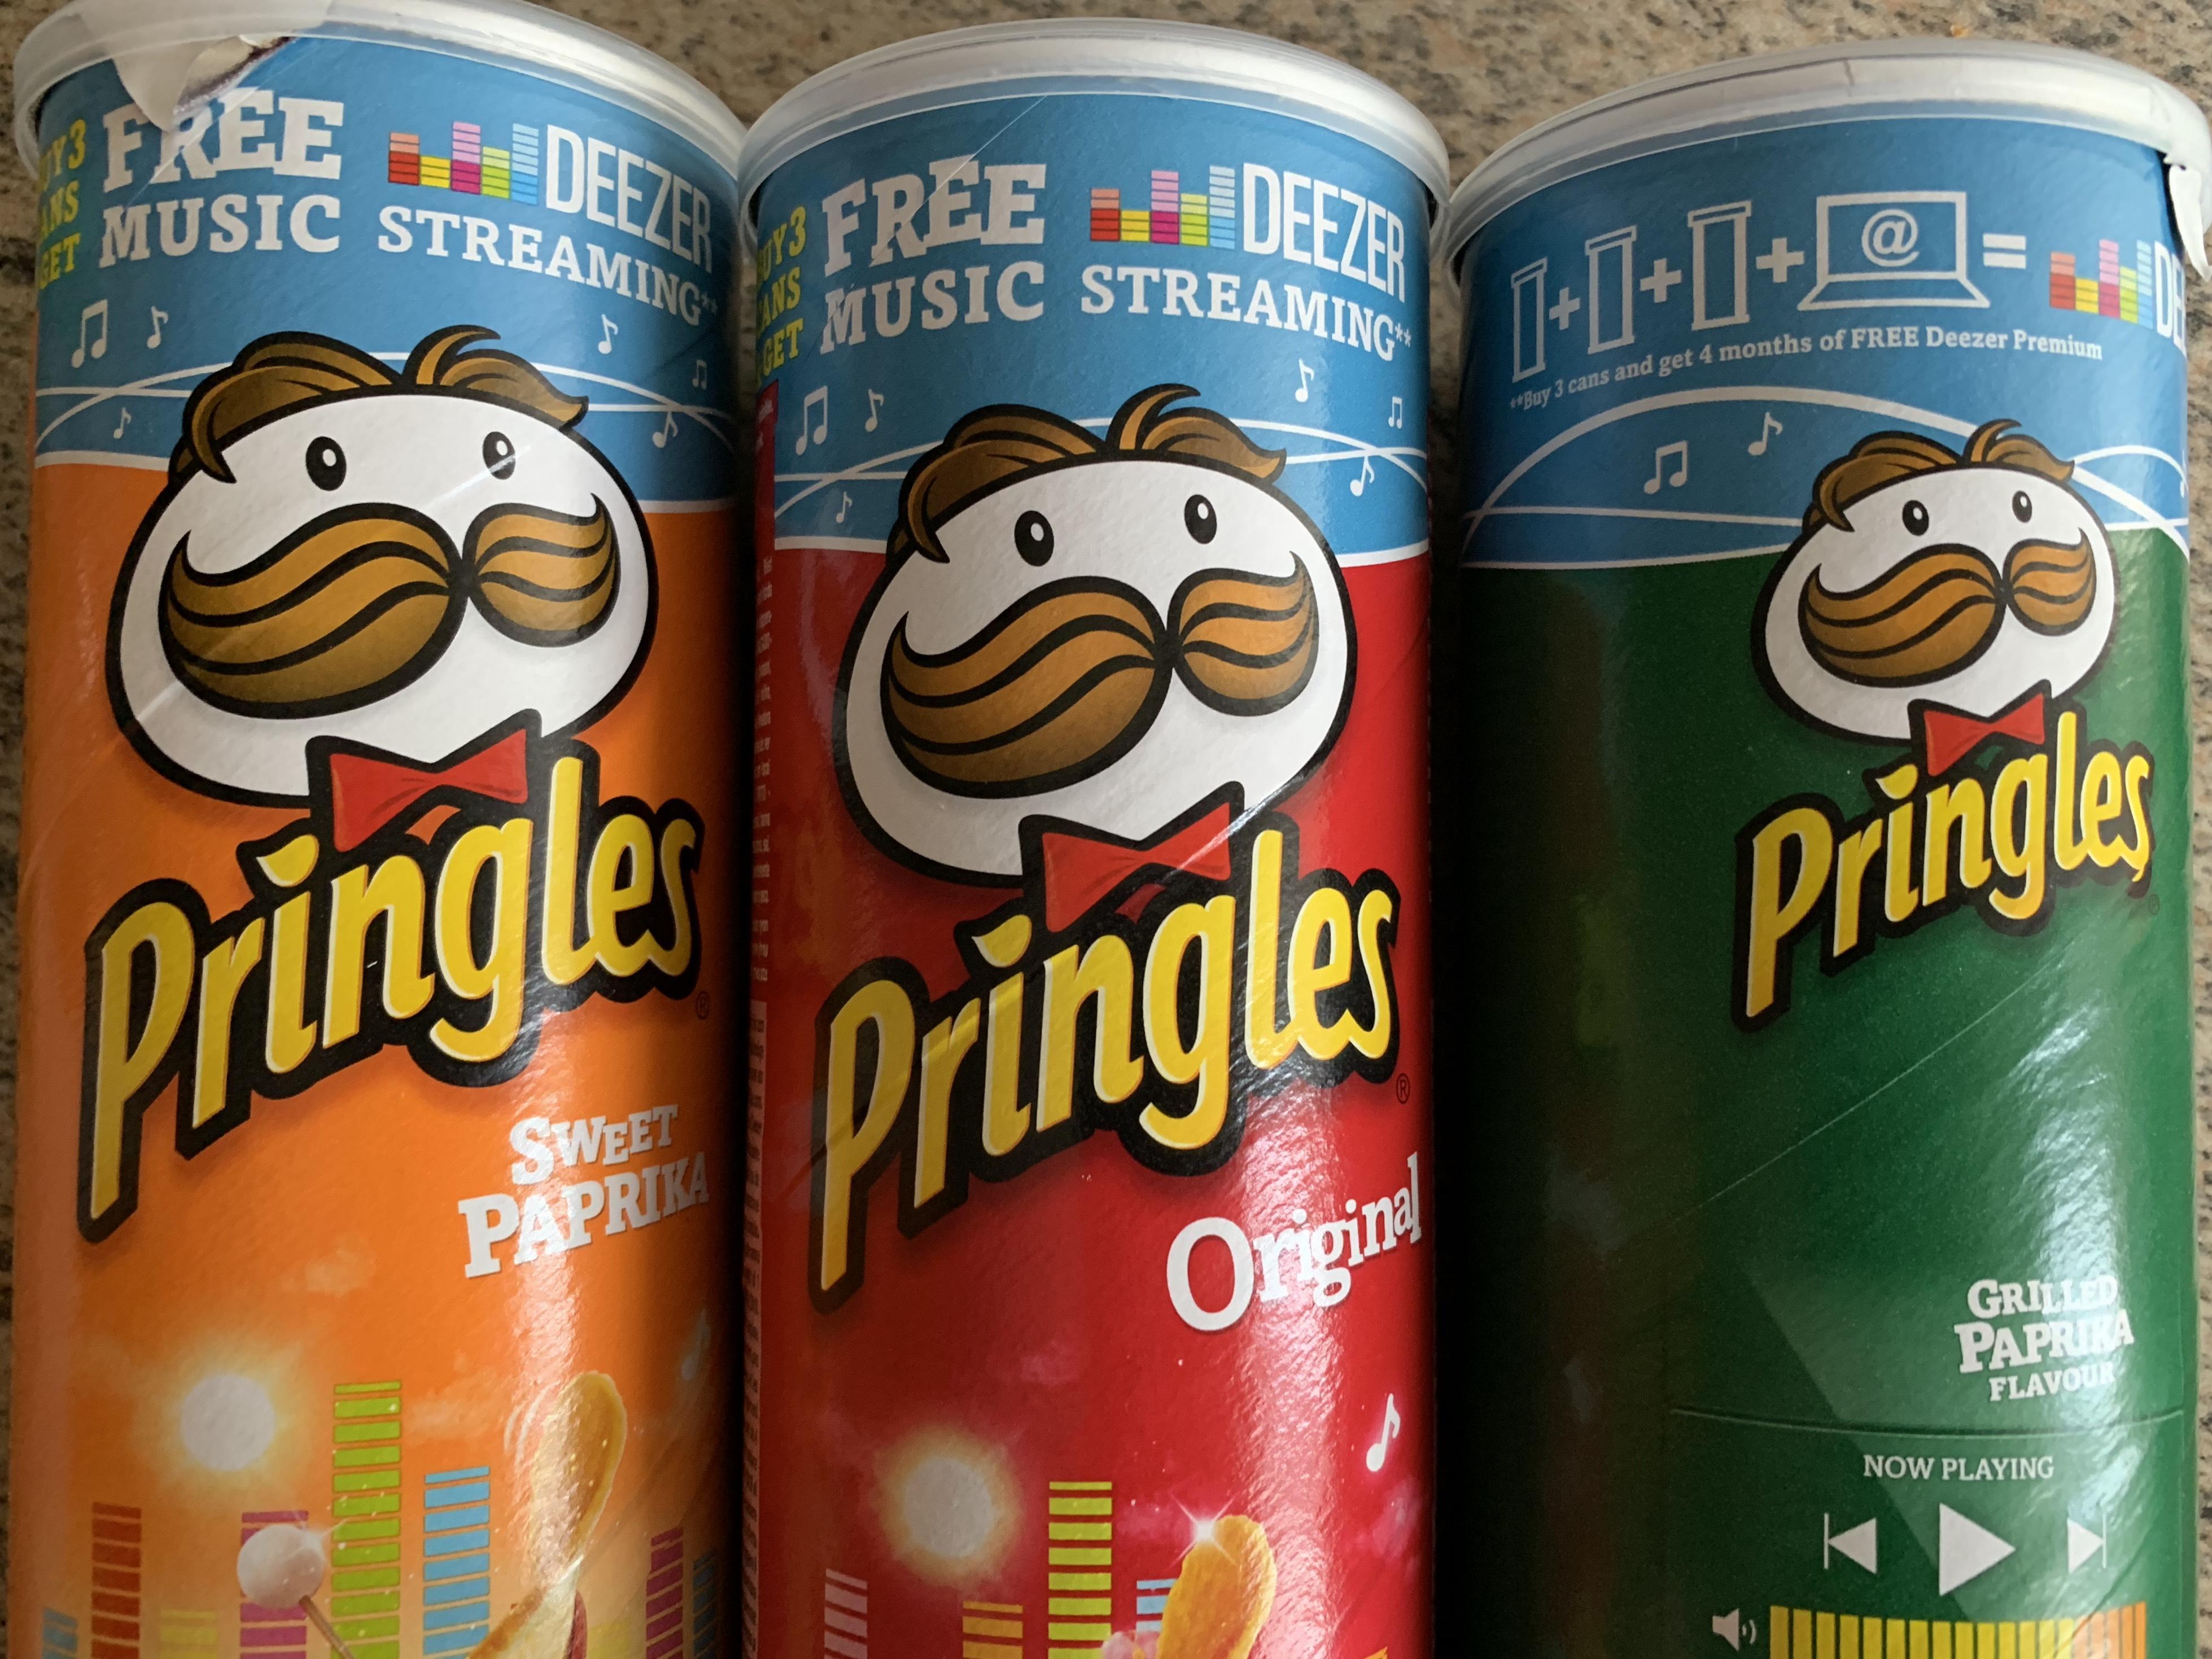 [lokal Stuttgart] 3x Pringles Dose Angebot inkl. 4 Monate Deezer Premium+